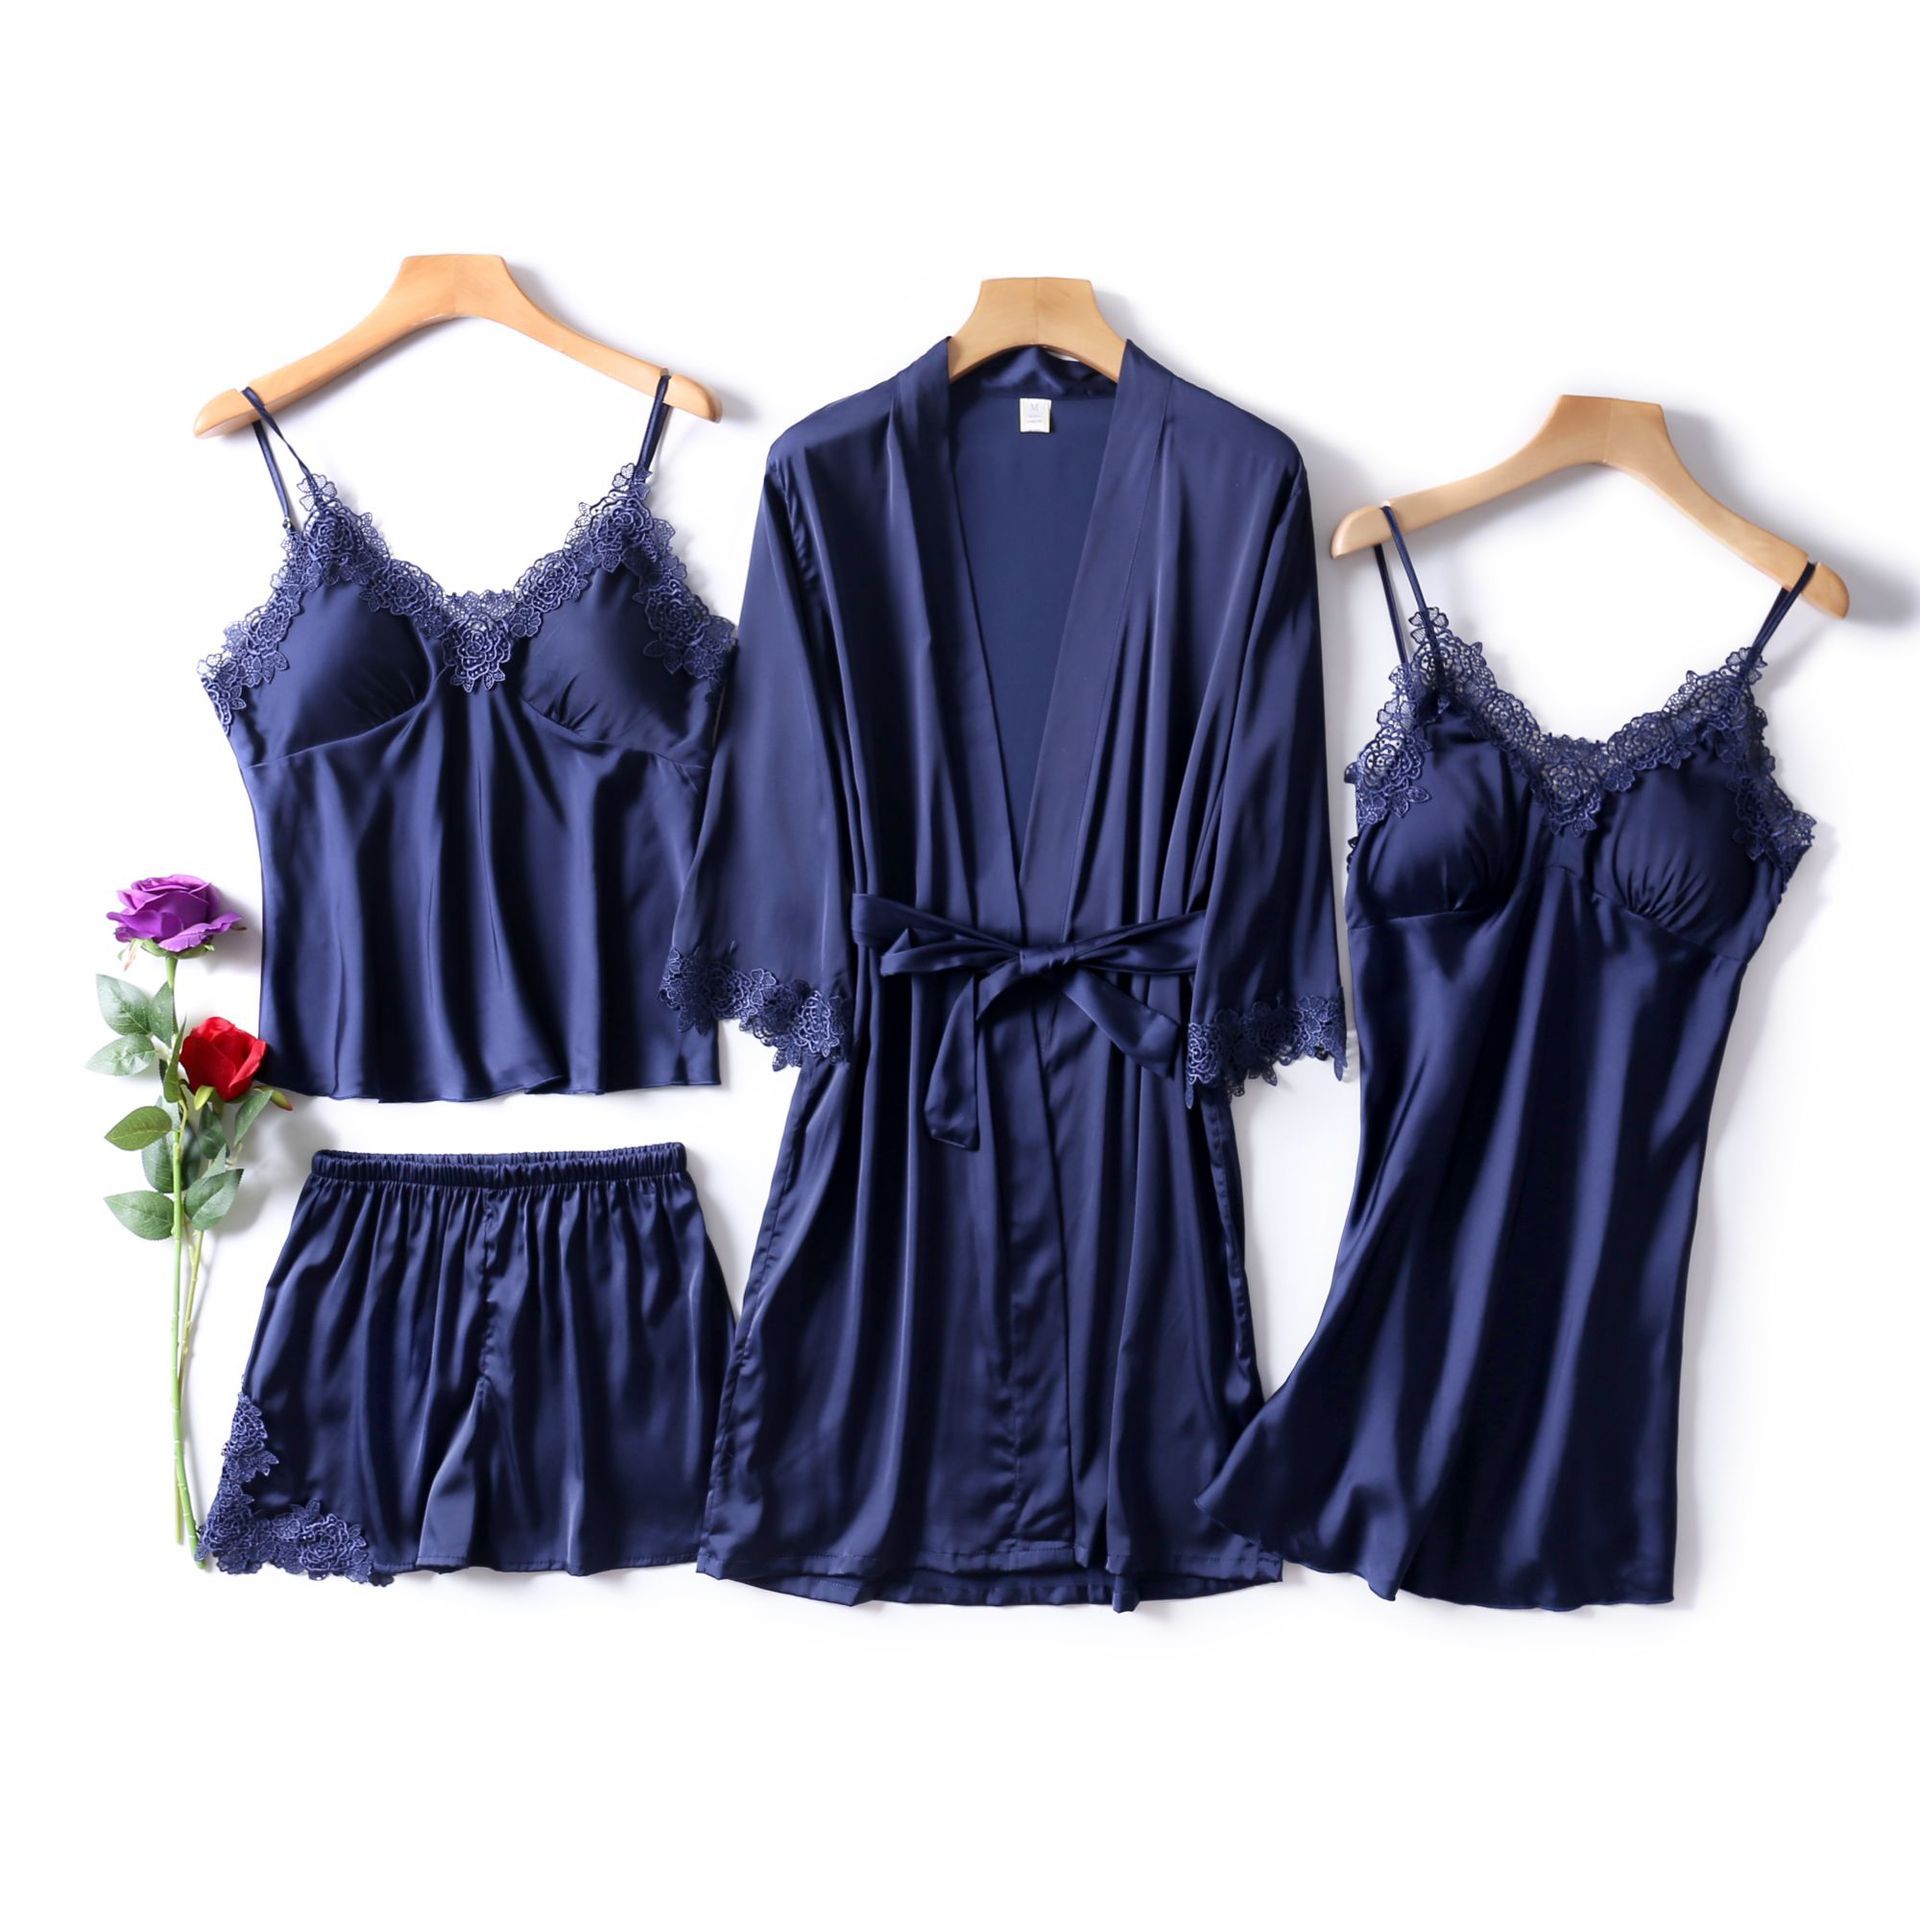 2019 New Style With Chest Pad Spaghetti Strap Pajamas Shorts Women's Sexy Nightgown Women's Robes Four-piece Set Silk Pajamas Sp